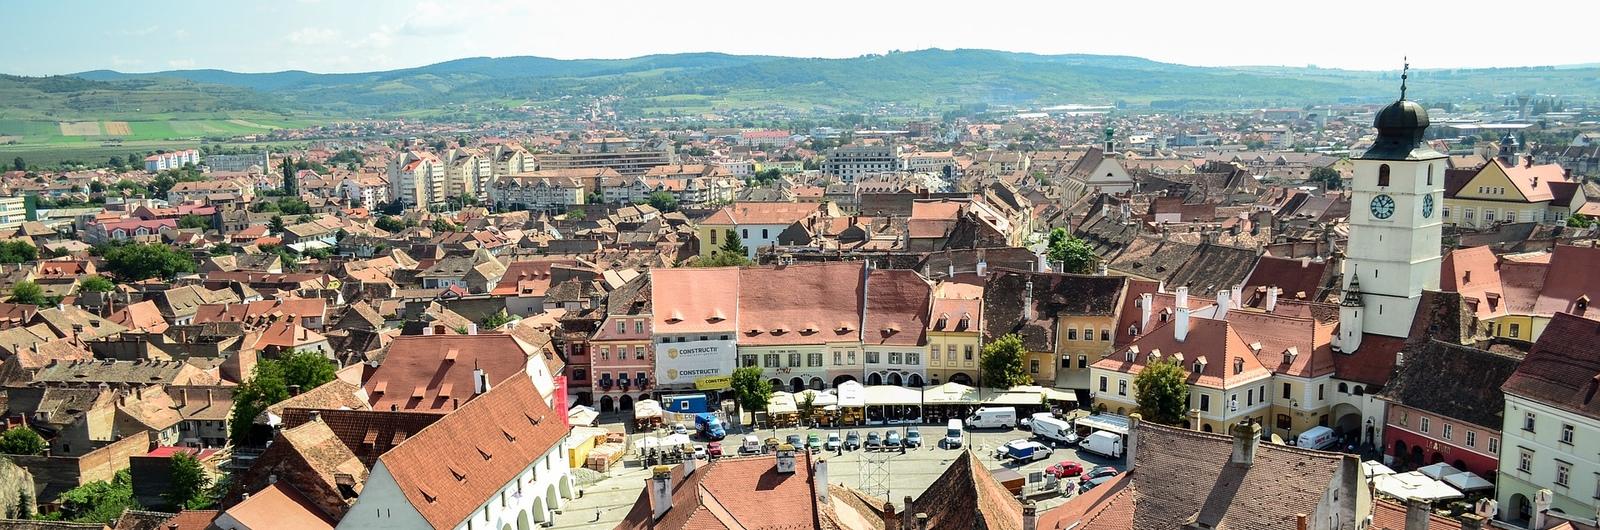 sibiu city header